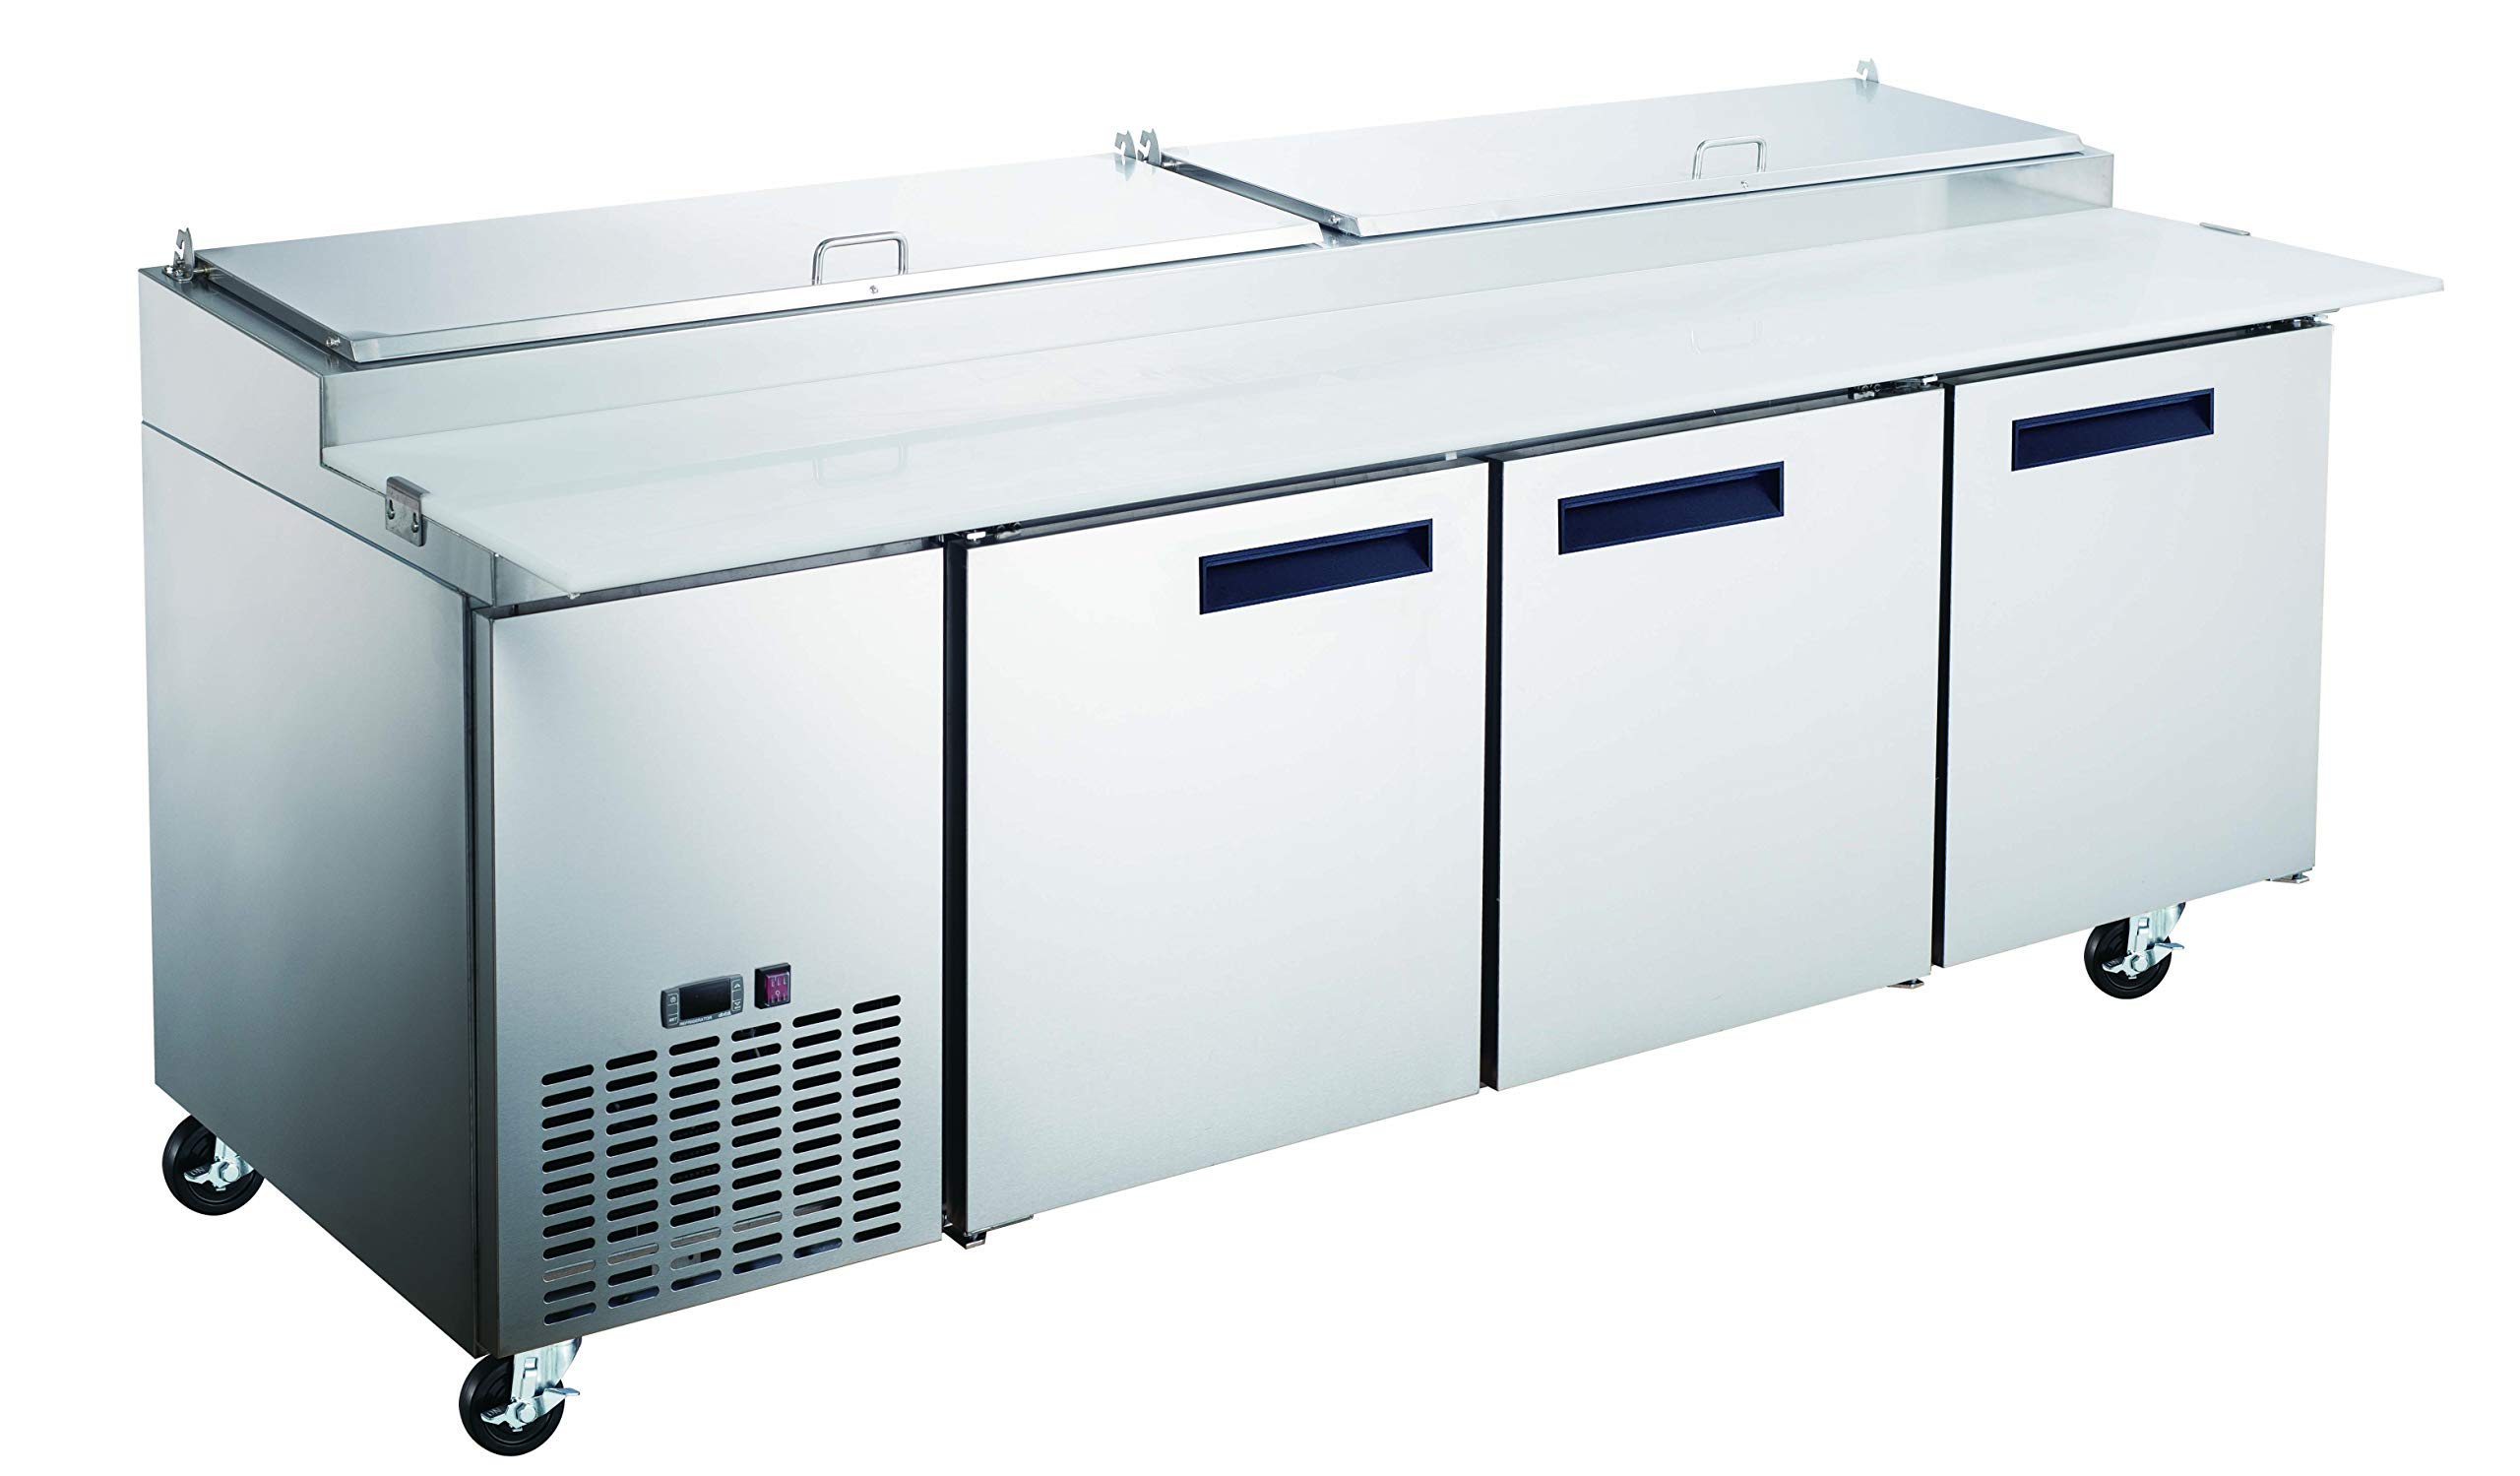 Commercial Grade Pizza Prep Table by Vortex Refrigeration | 3 Door Refrigeration | 26 Cu. Ft. | Includes Polyurethane Cutting Board | 93''W x 33''D x 42''H by Vortex Refrigeration